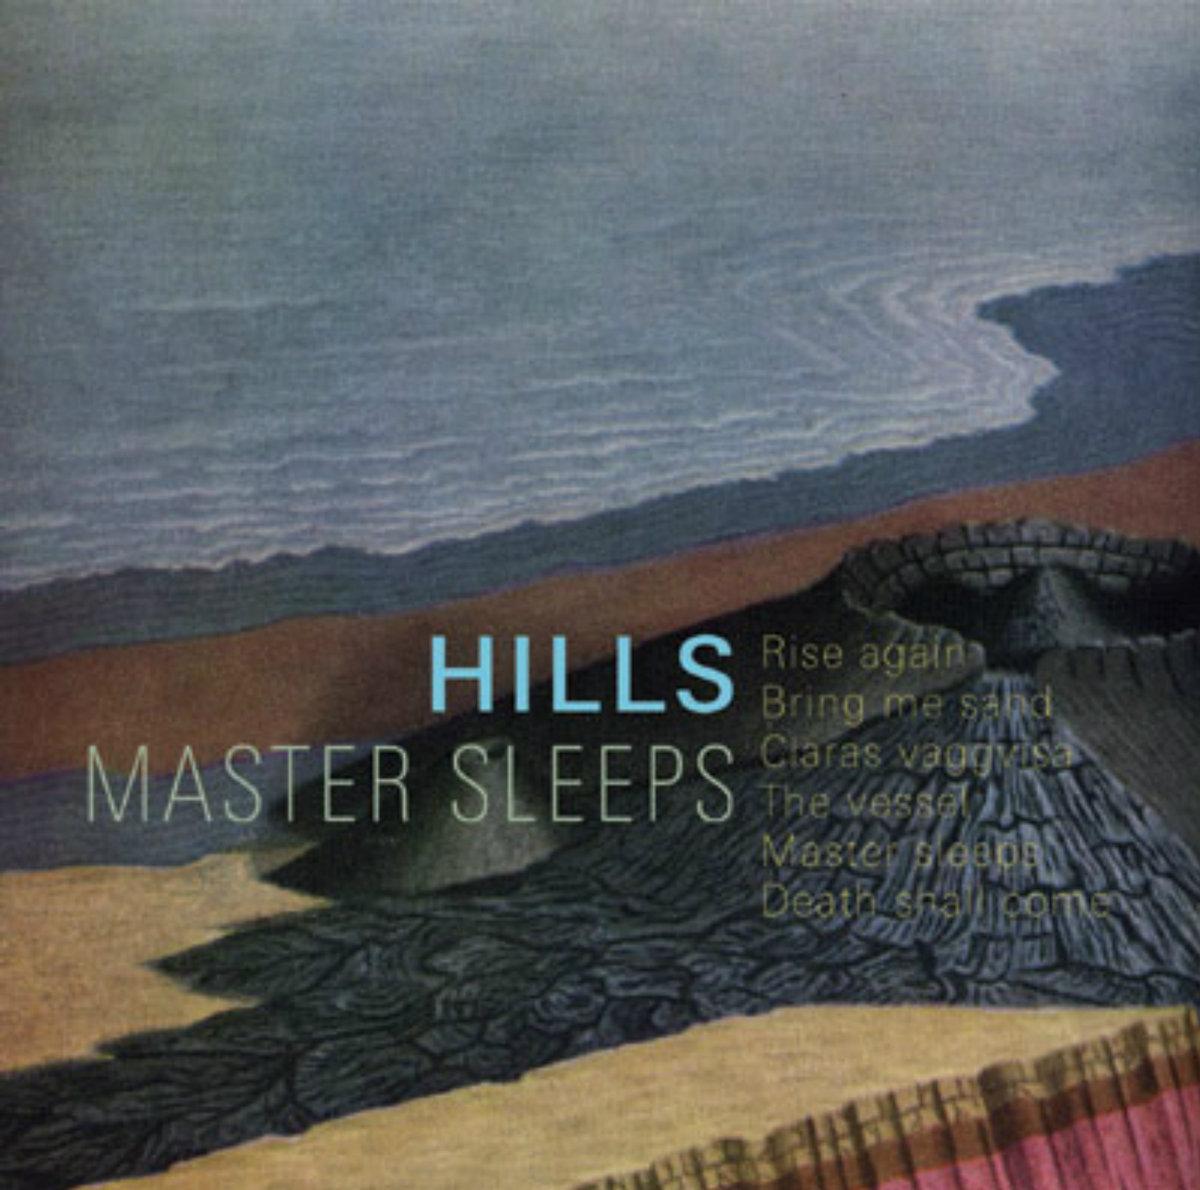 hills master sleeps